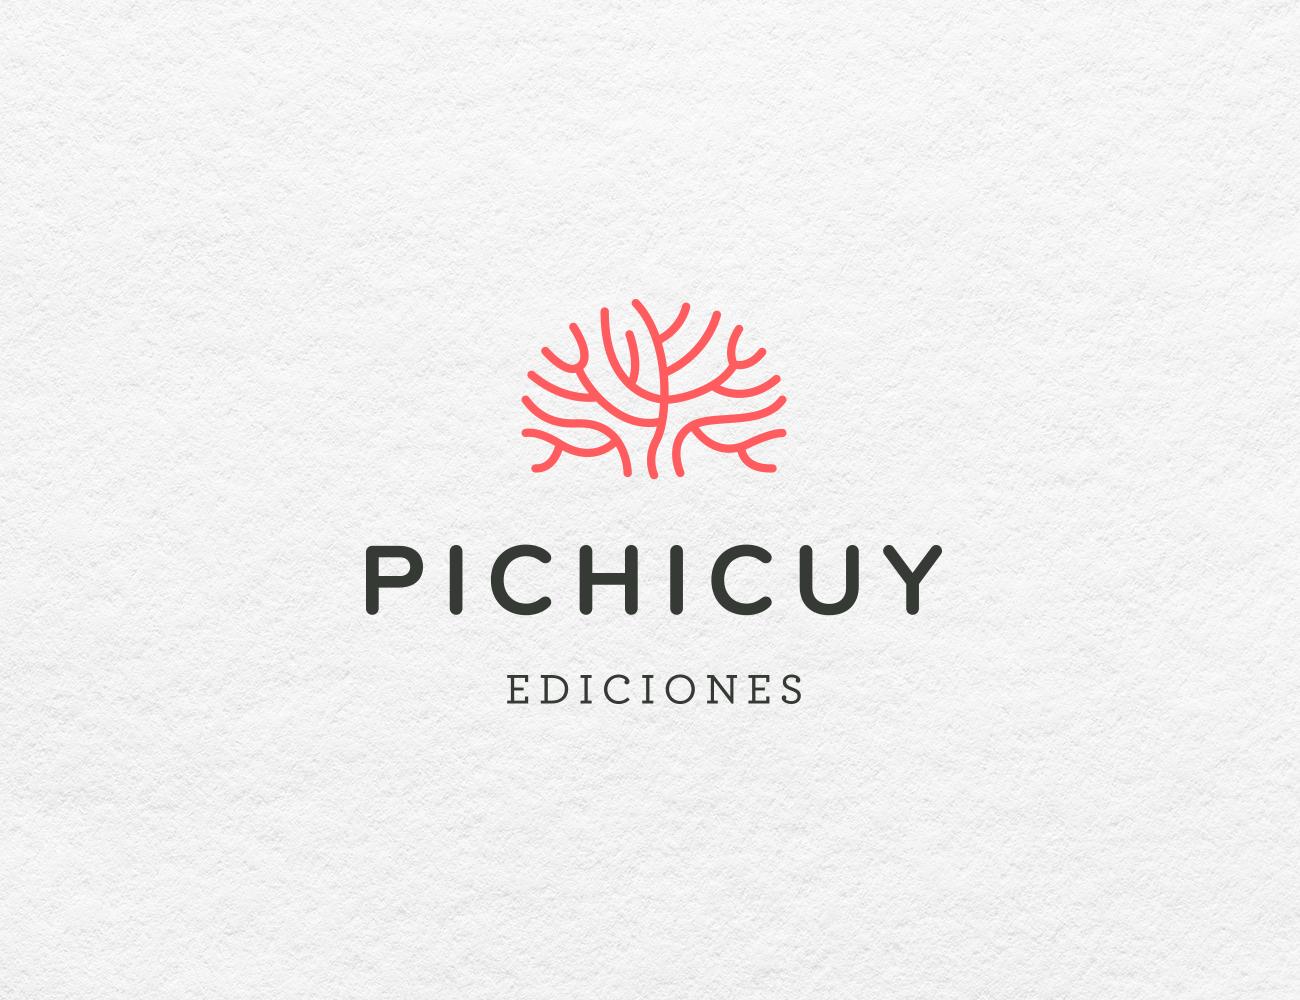 01-Pichicuy